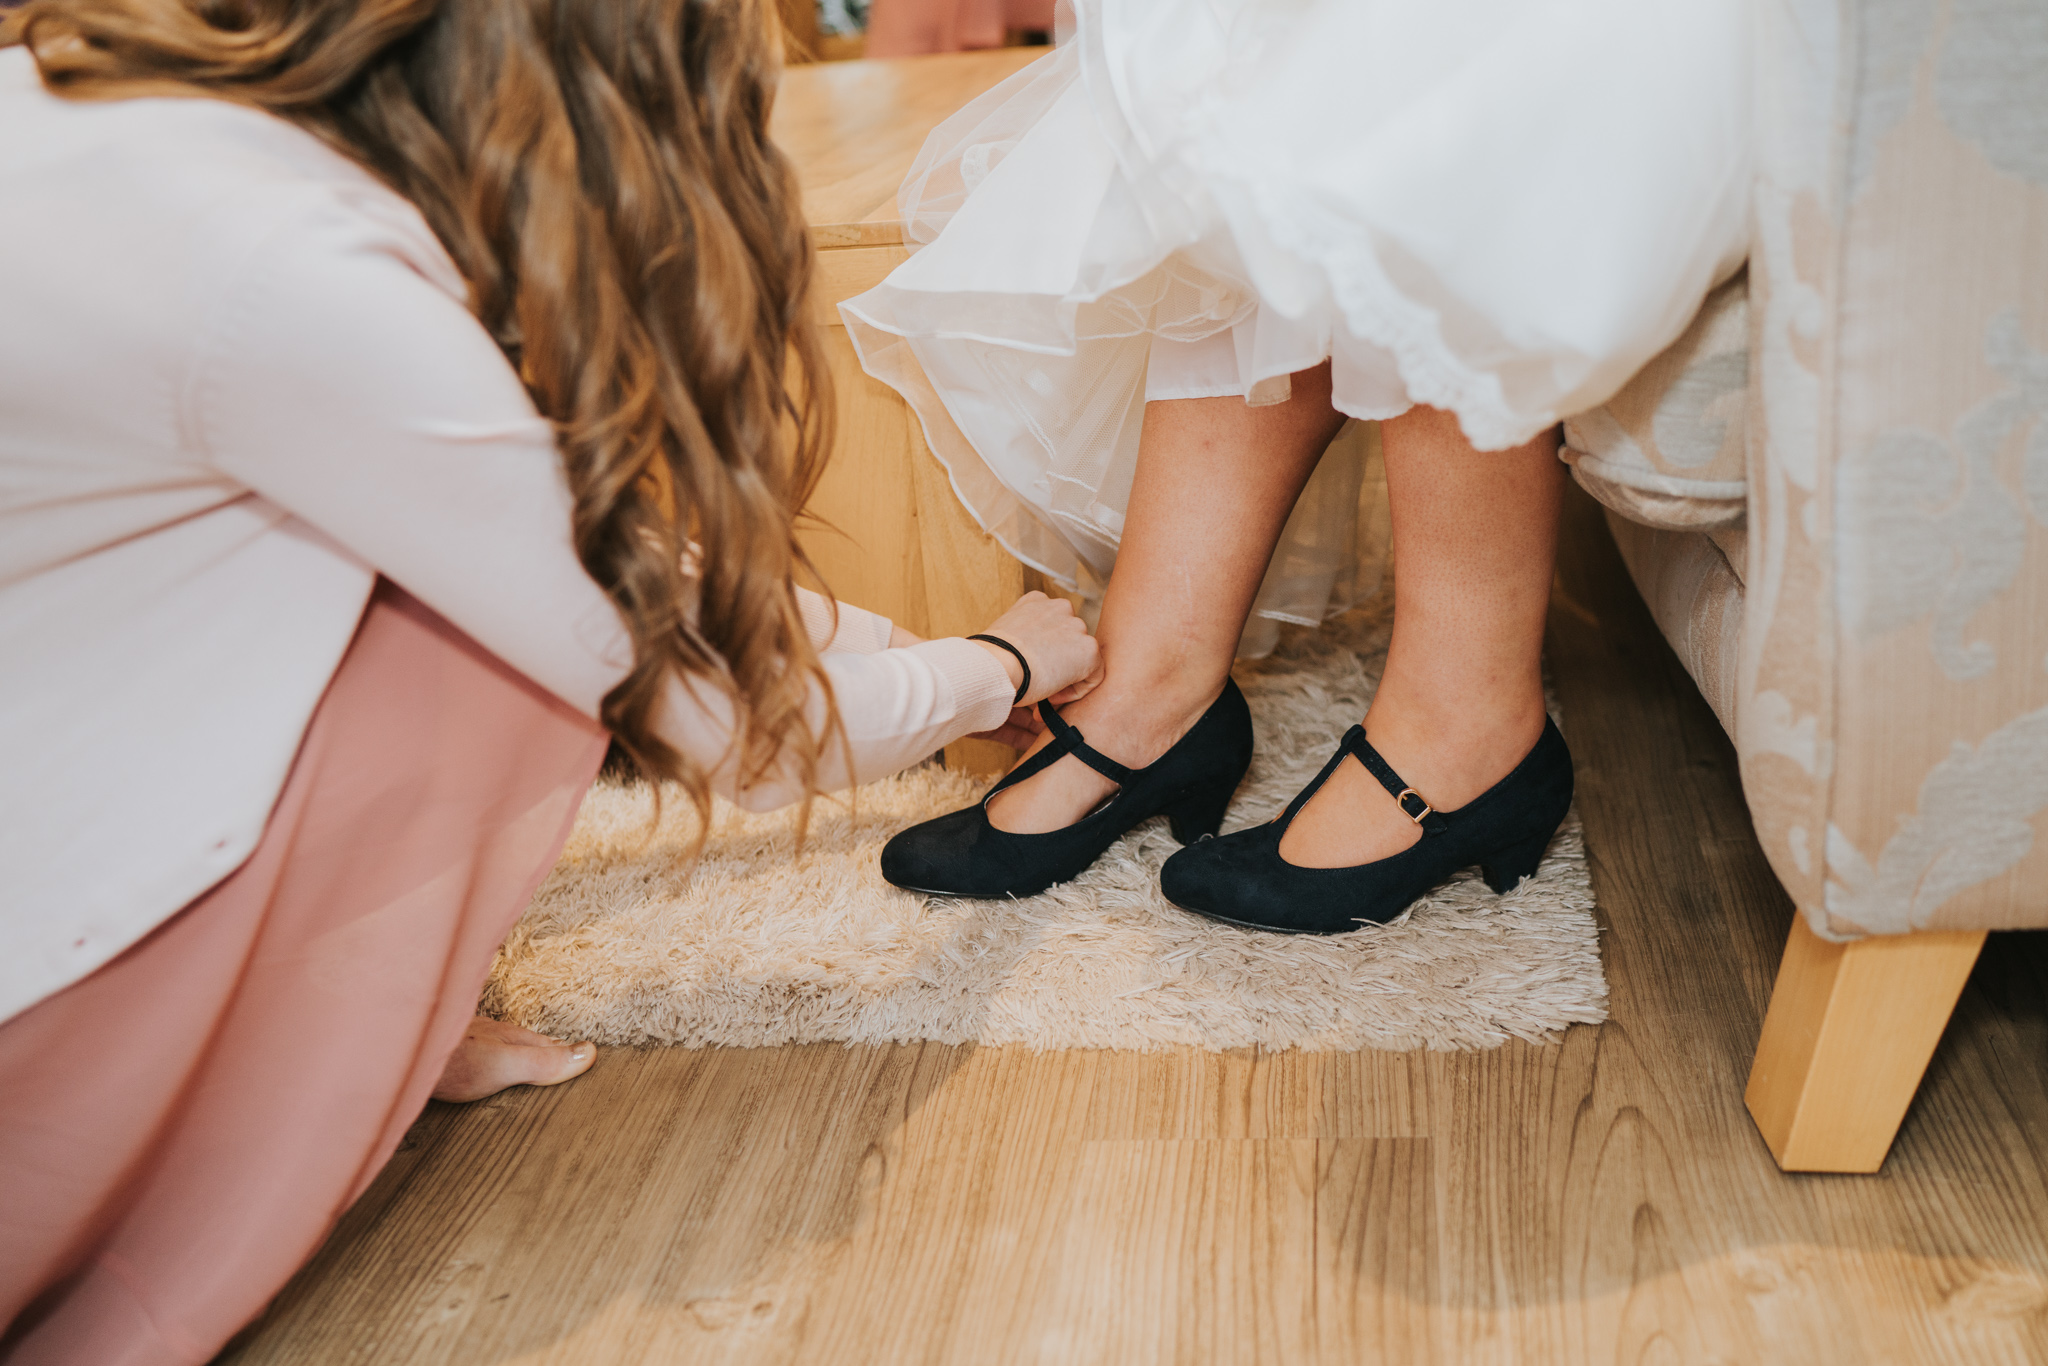 rhia-james-rustic-crabbs-barn-vintage-50s-retro-wedding-grace-elizabeth-colchester-essex-alternative-relaxed-wedding-family-photography-devon-suffolk-norfolk-essex (37 of 138).jpg